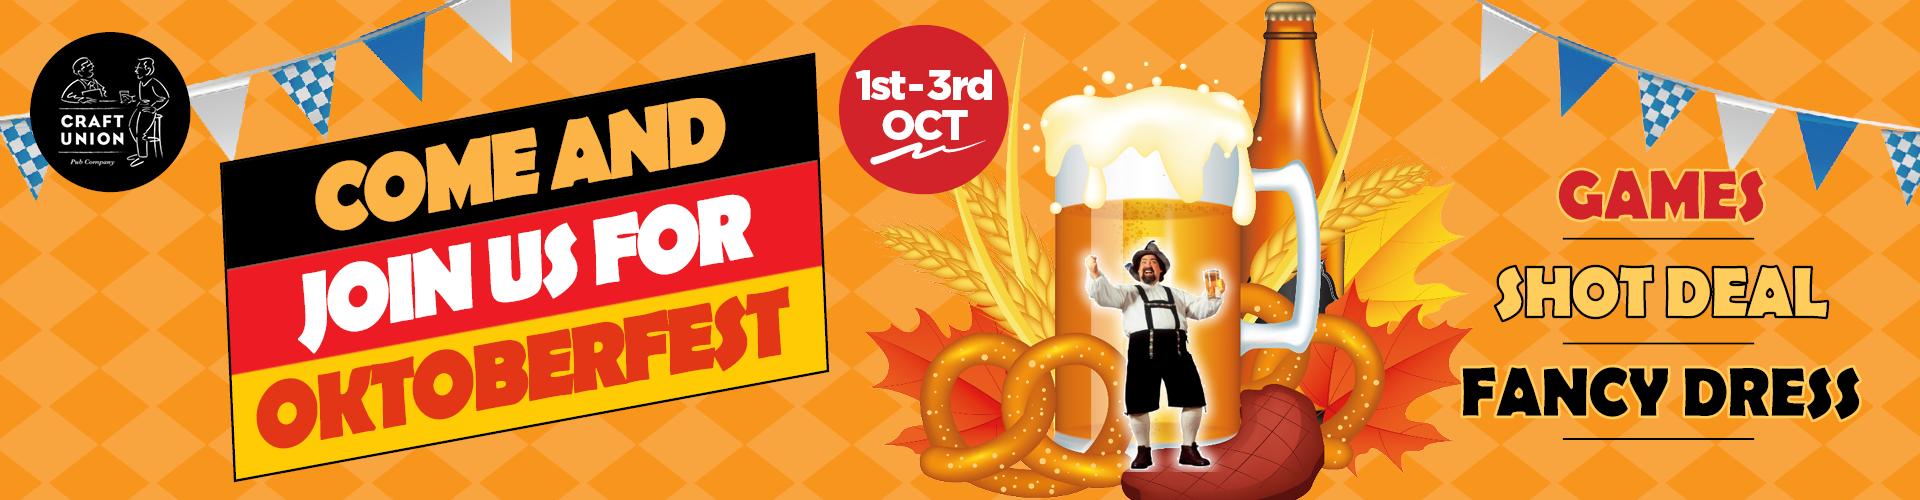 Oktoberfest 2021 Events Craft Union Pub Compny